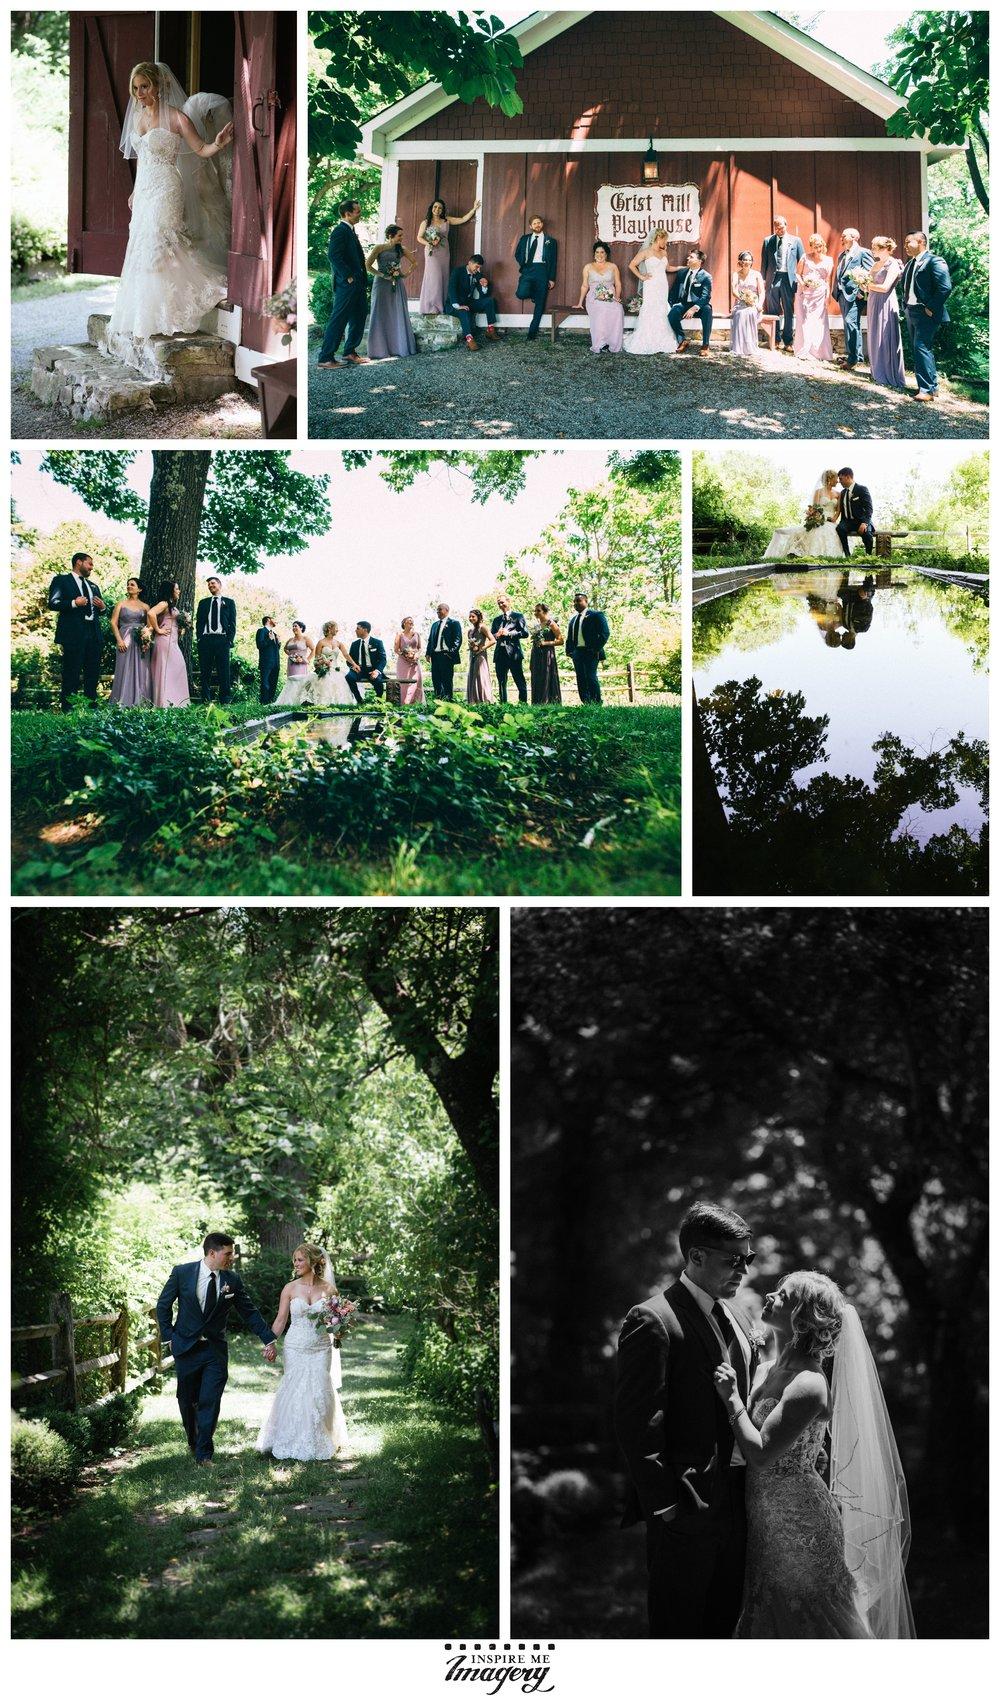 Wedding Photos at the Crossed Keys Estate / 289 Pequest Rd, Andover, NJ 07821 /  http://www.crossedkeys.com/  / (973) 786-6661